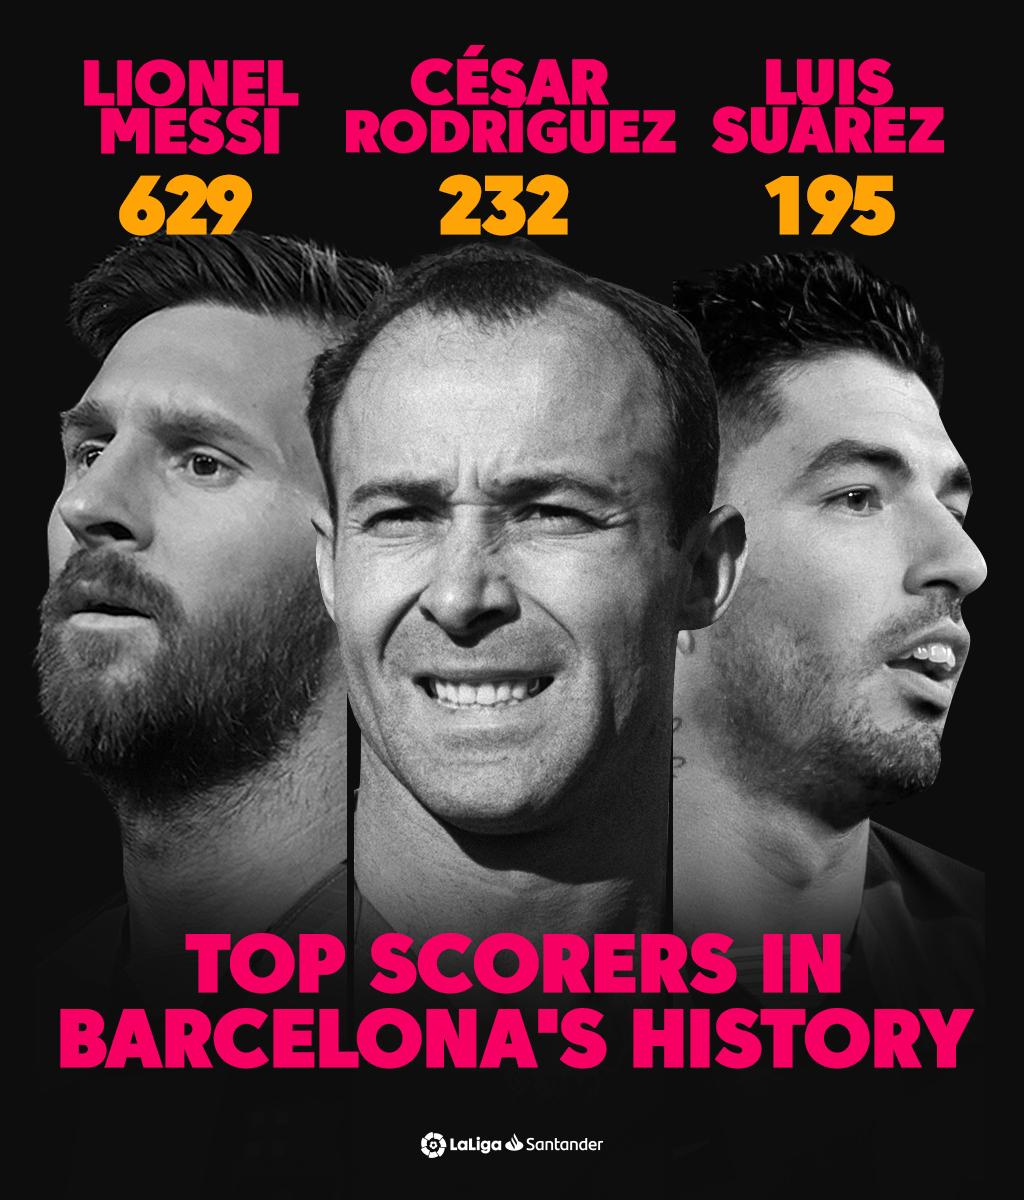 🌟1⃣9⃣5⃣🌟  @LuisSuarez9 overtakes Laszlo Kubala (194) and is now the THIRD TOP SCORER in @FCBarcelona's history! 💙🔝❤️  #BarçaEspanyol https://t.co/4ONWjxrmts